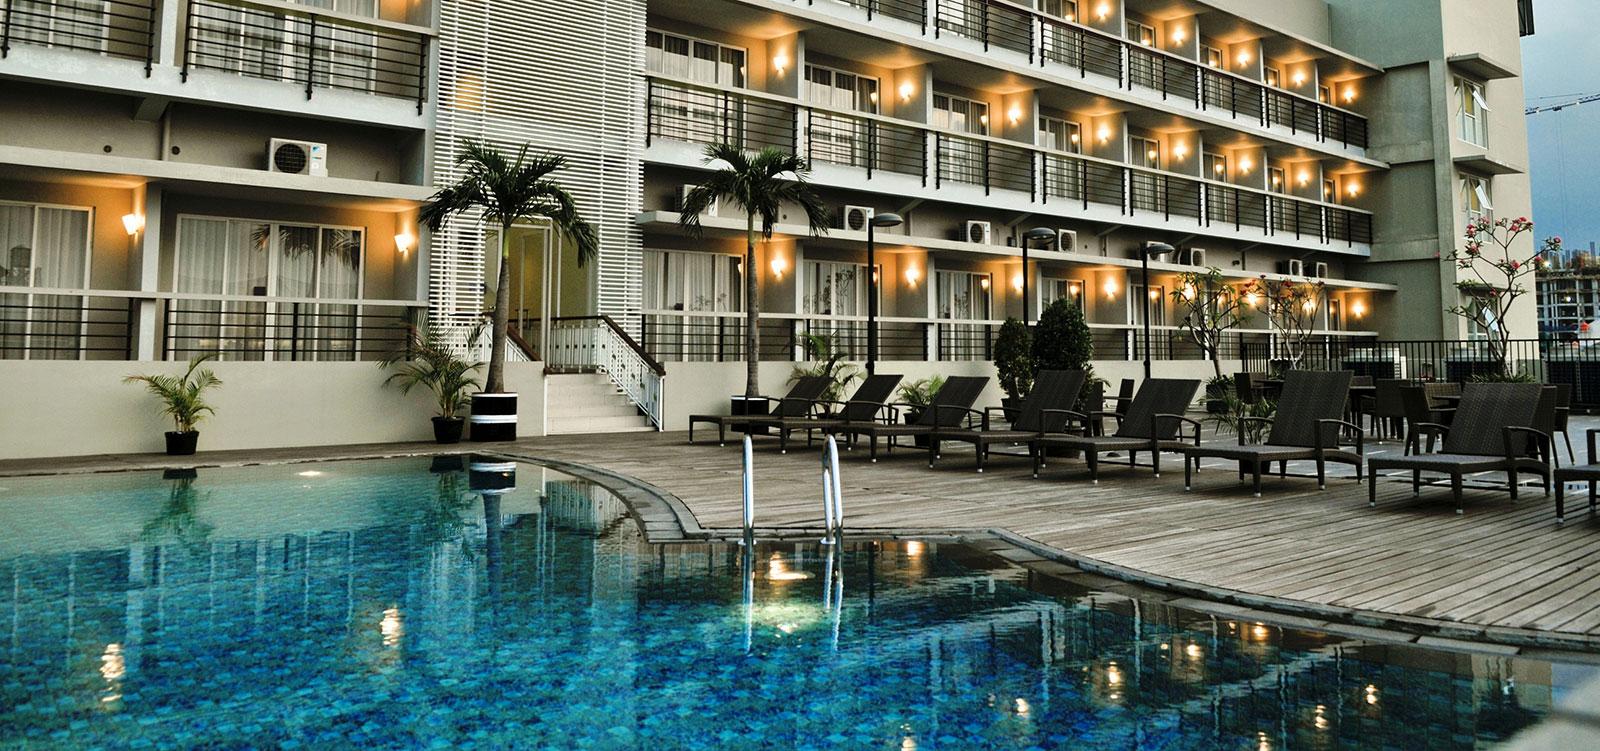 Quest Semarang Business And Leisure Hotel In Semarang